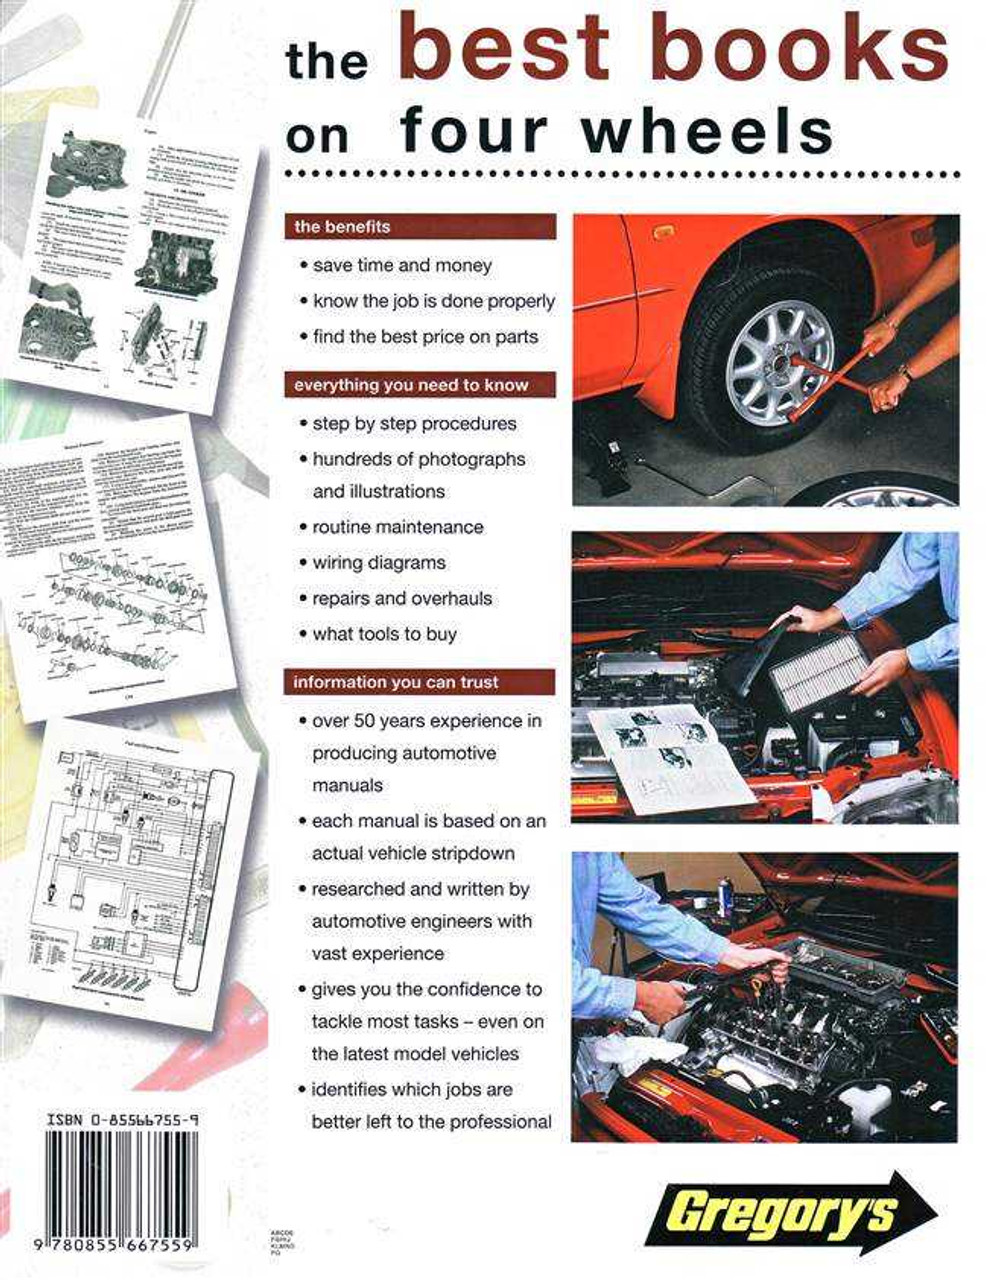 vq statesman workshop manual pdf